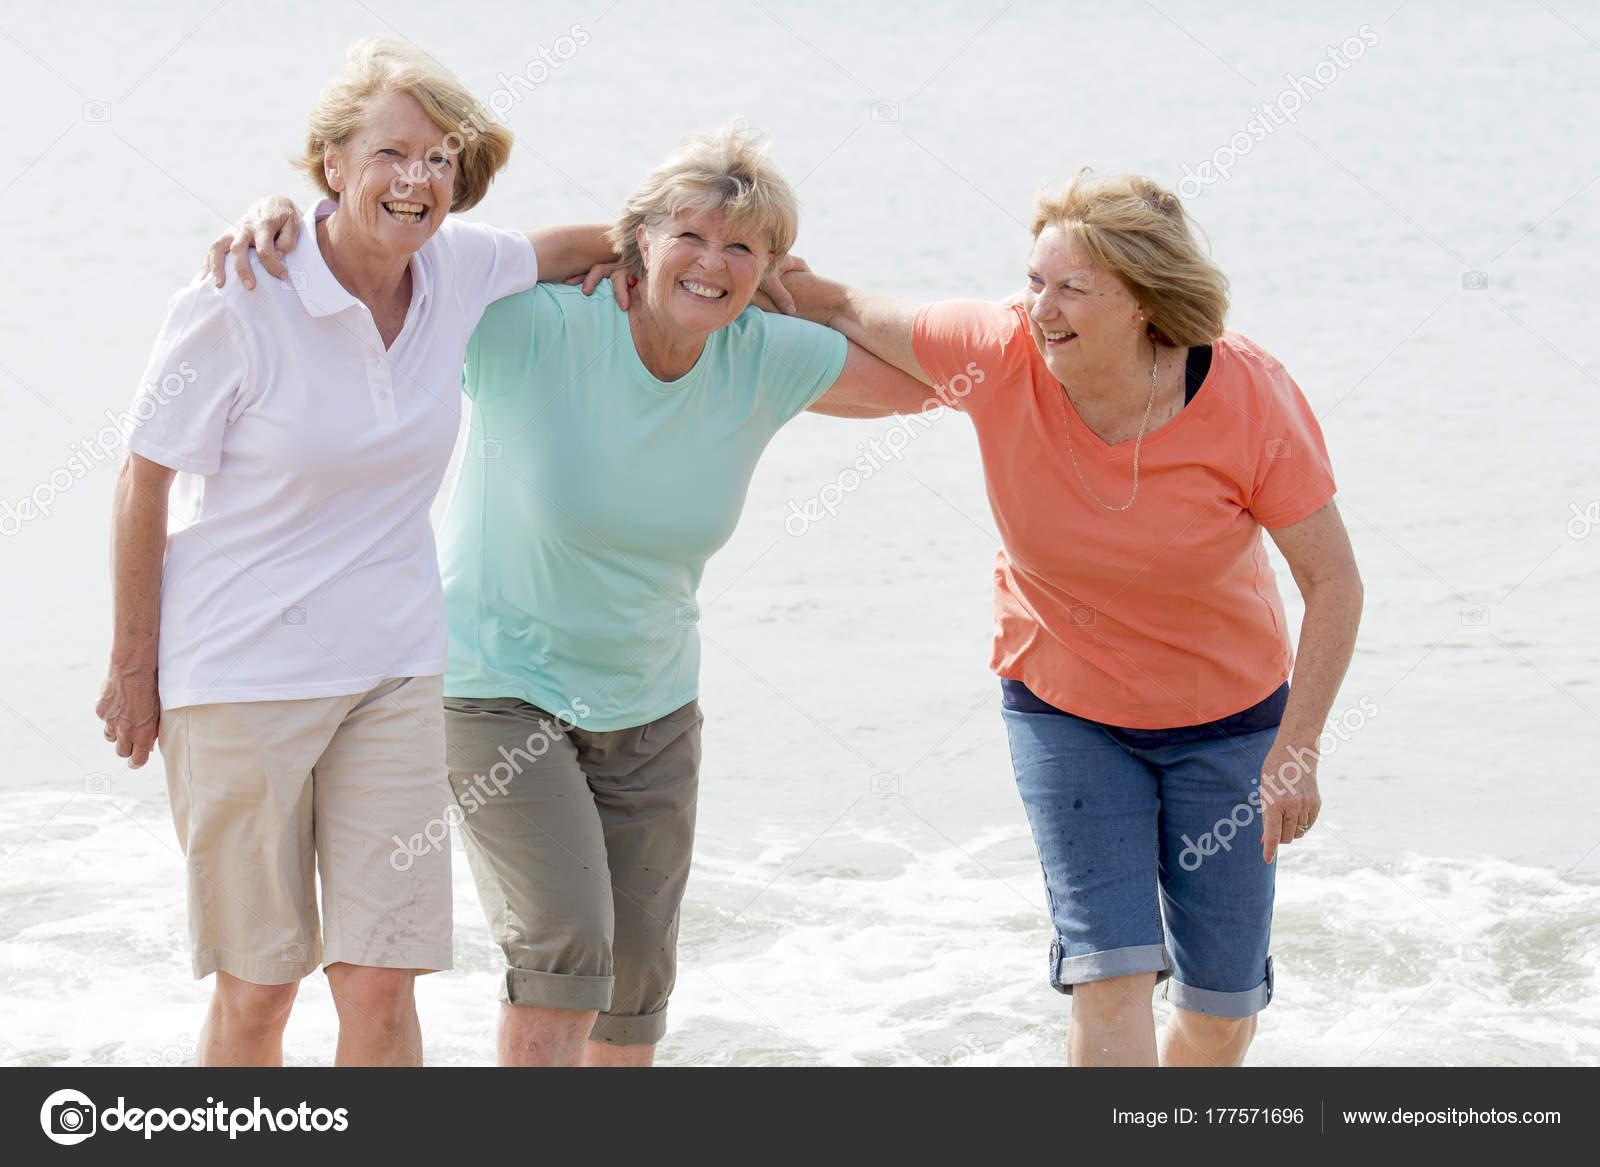 lovely group of three senior mature retired women on their 60s